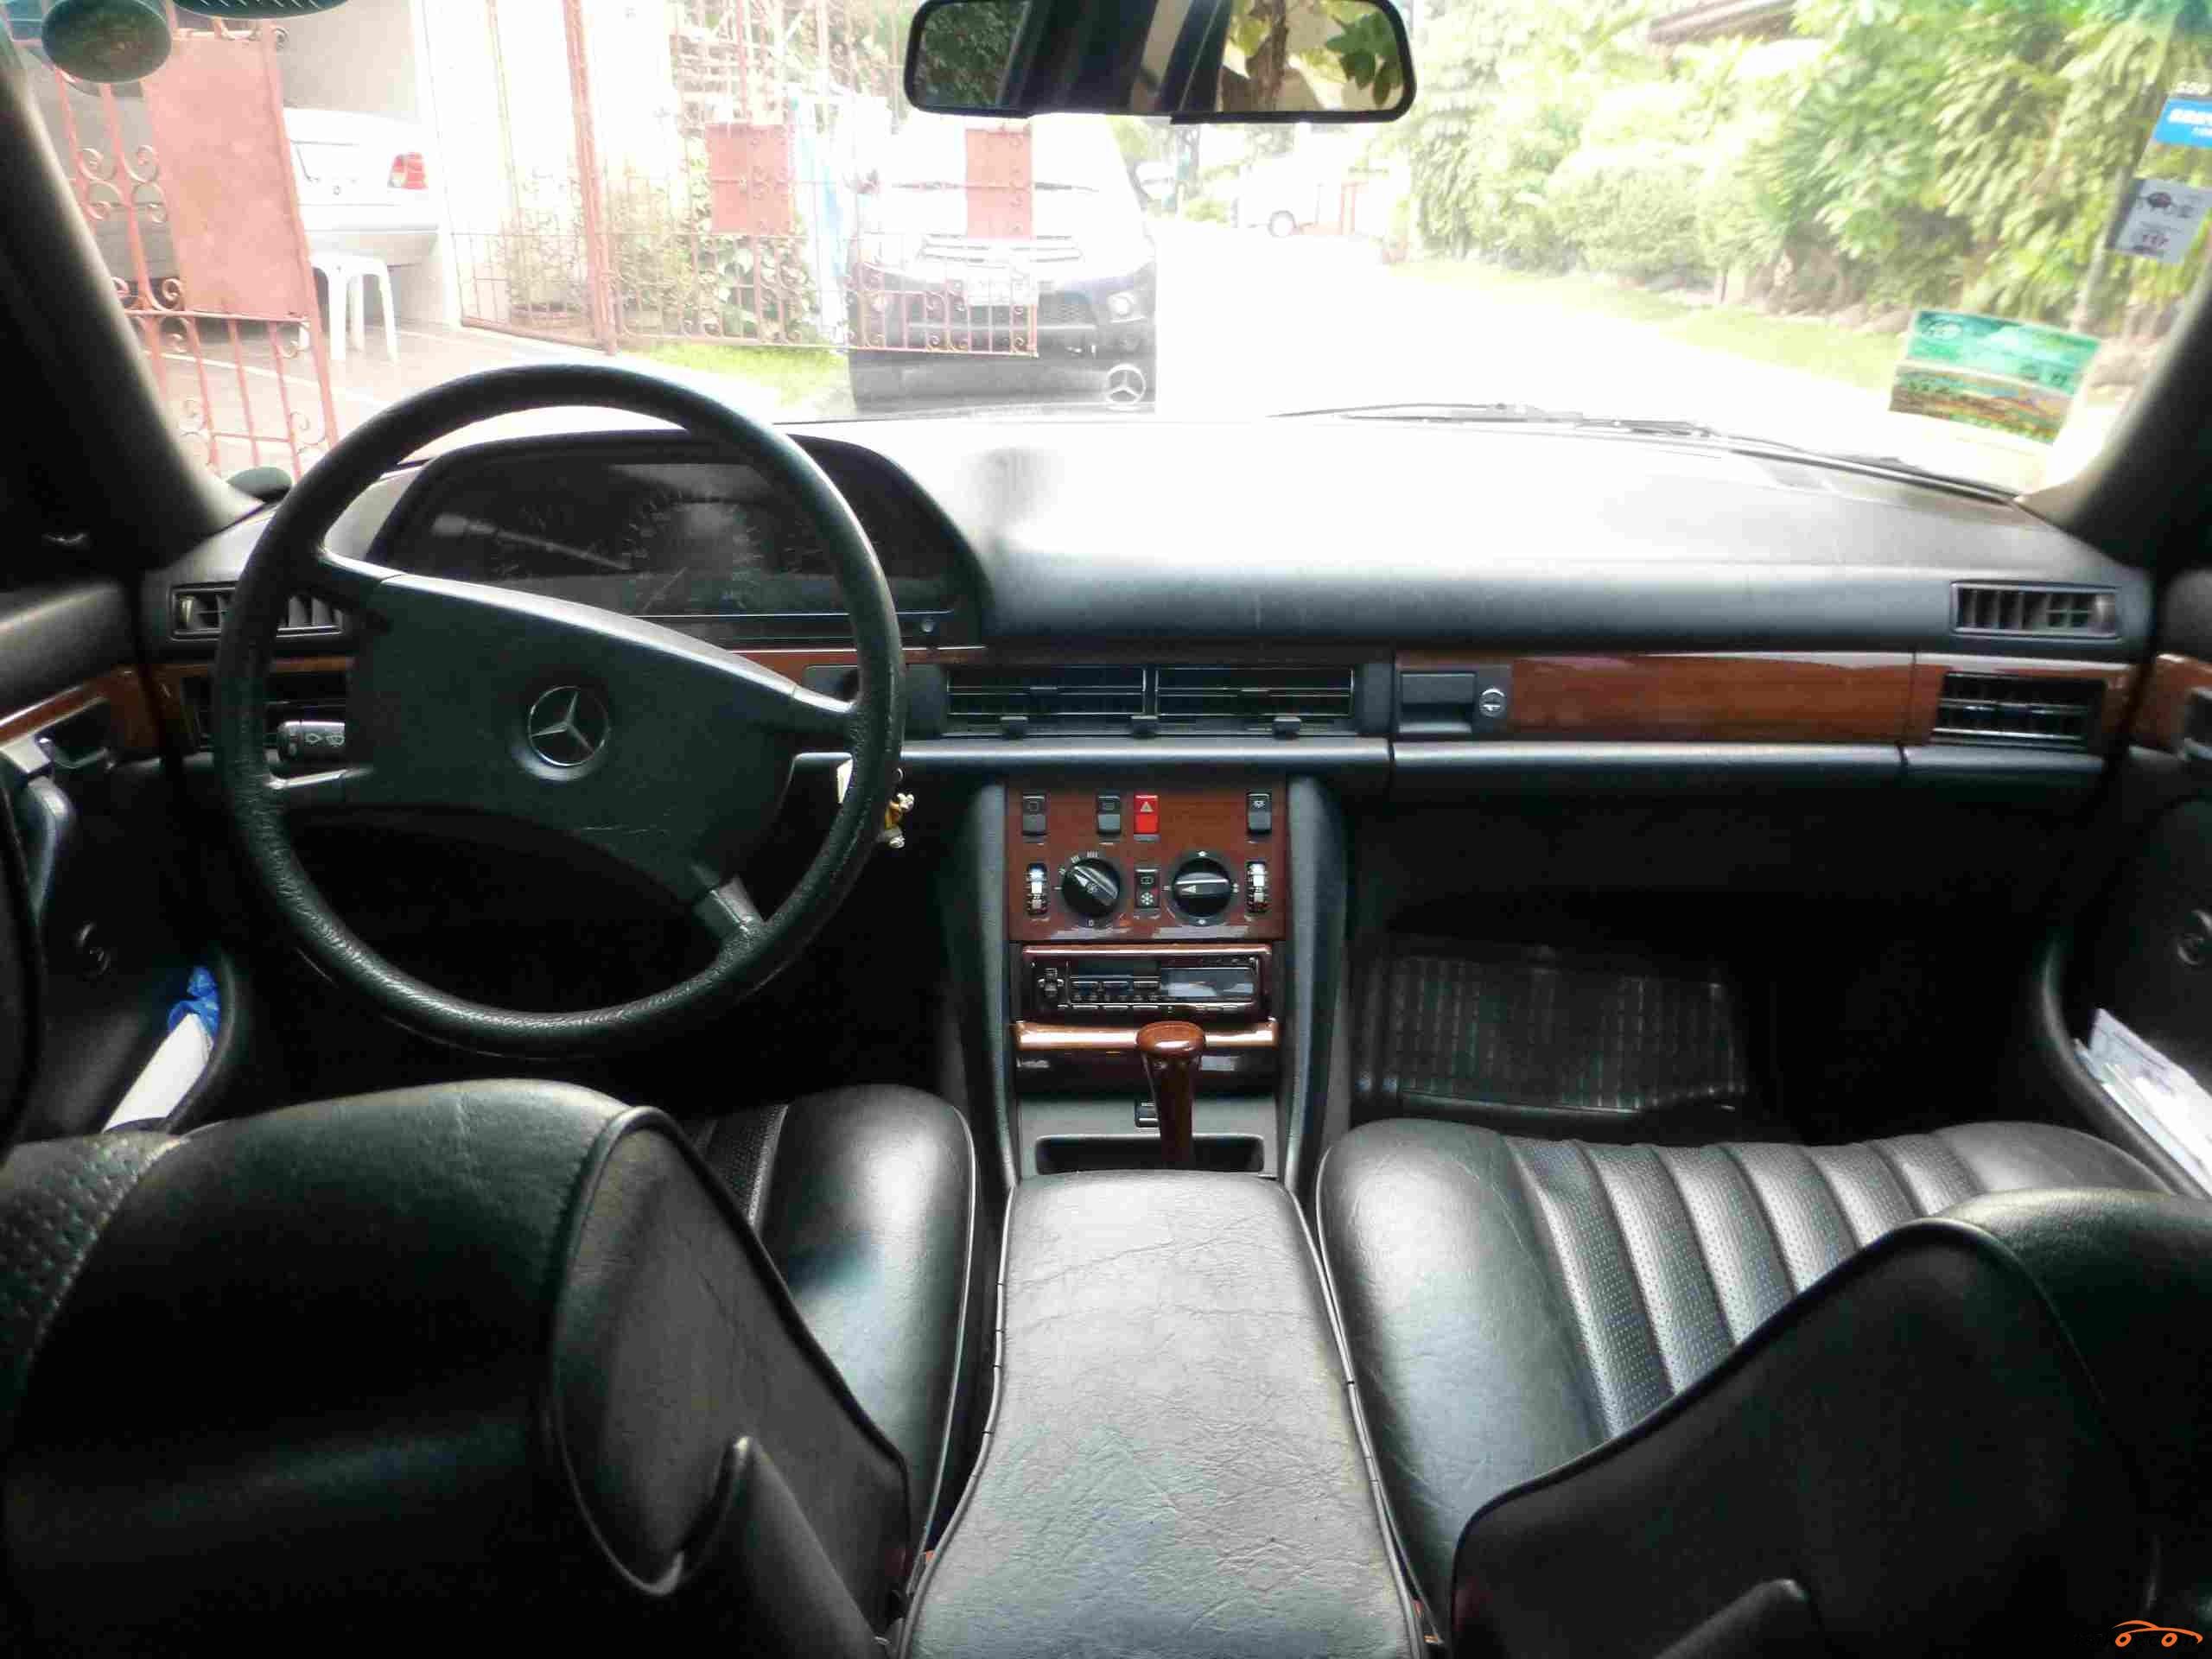 Mercedes-Benz 300 1986 - 7